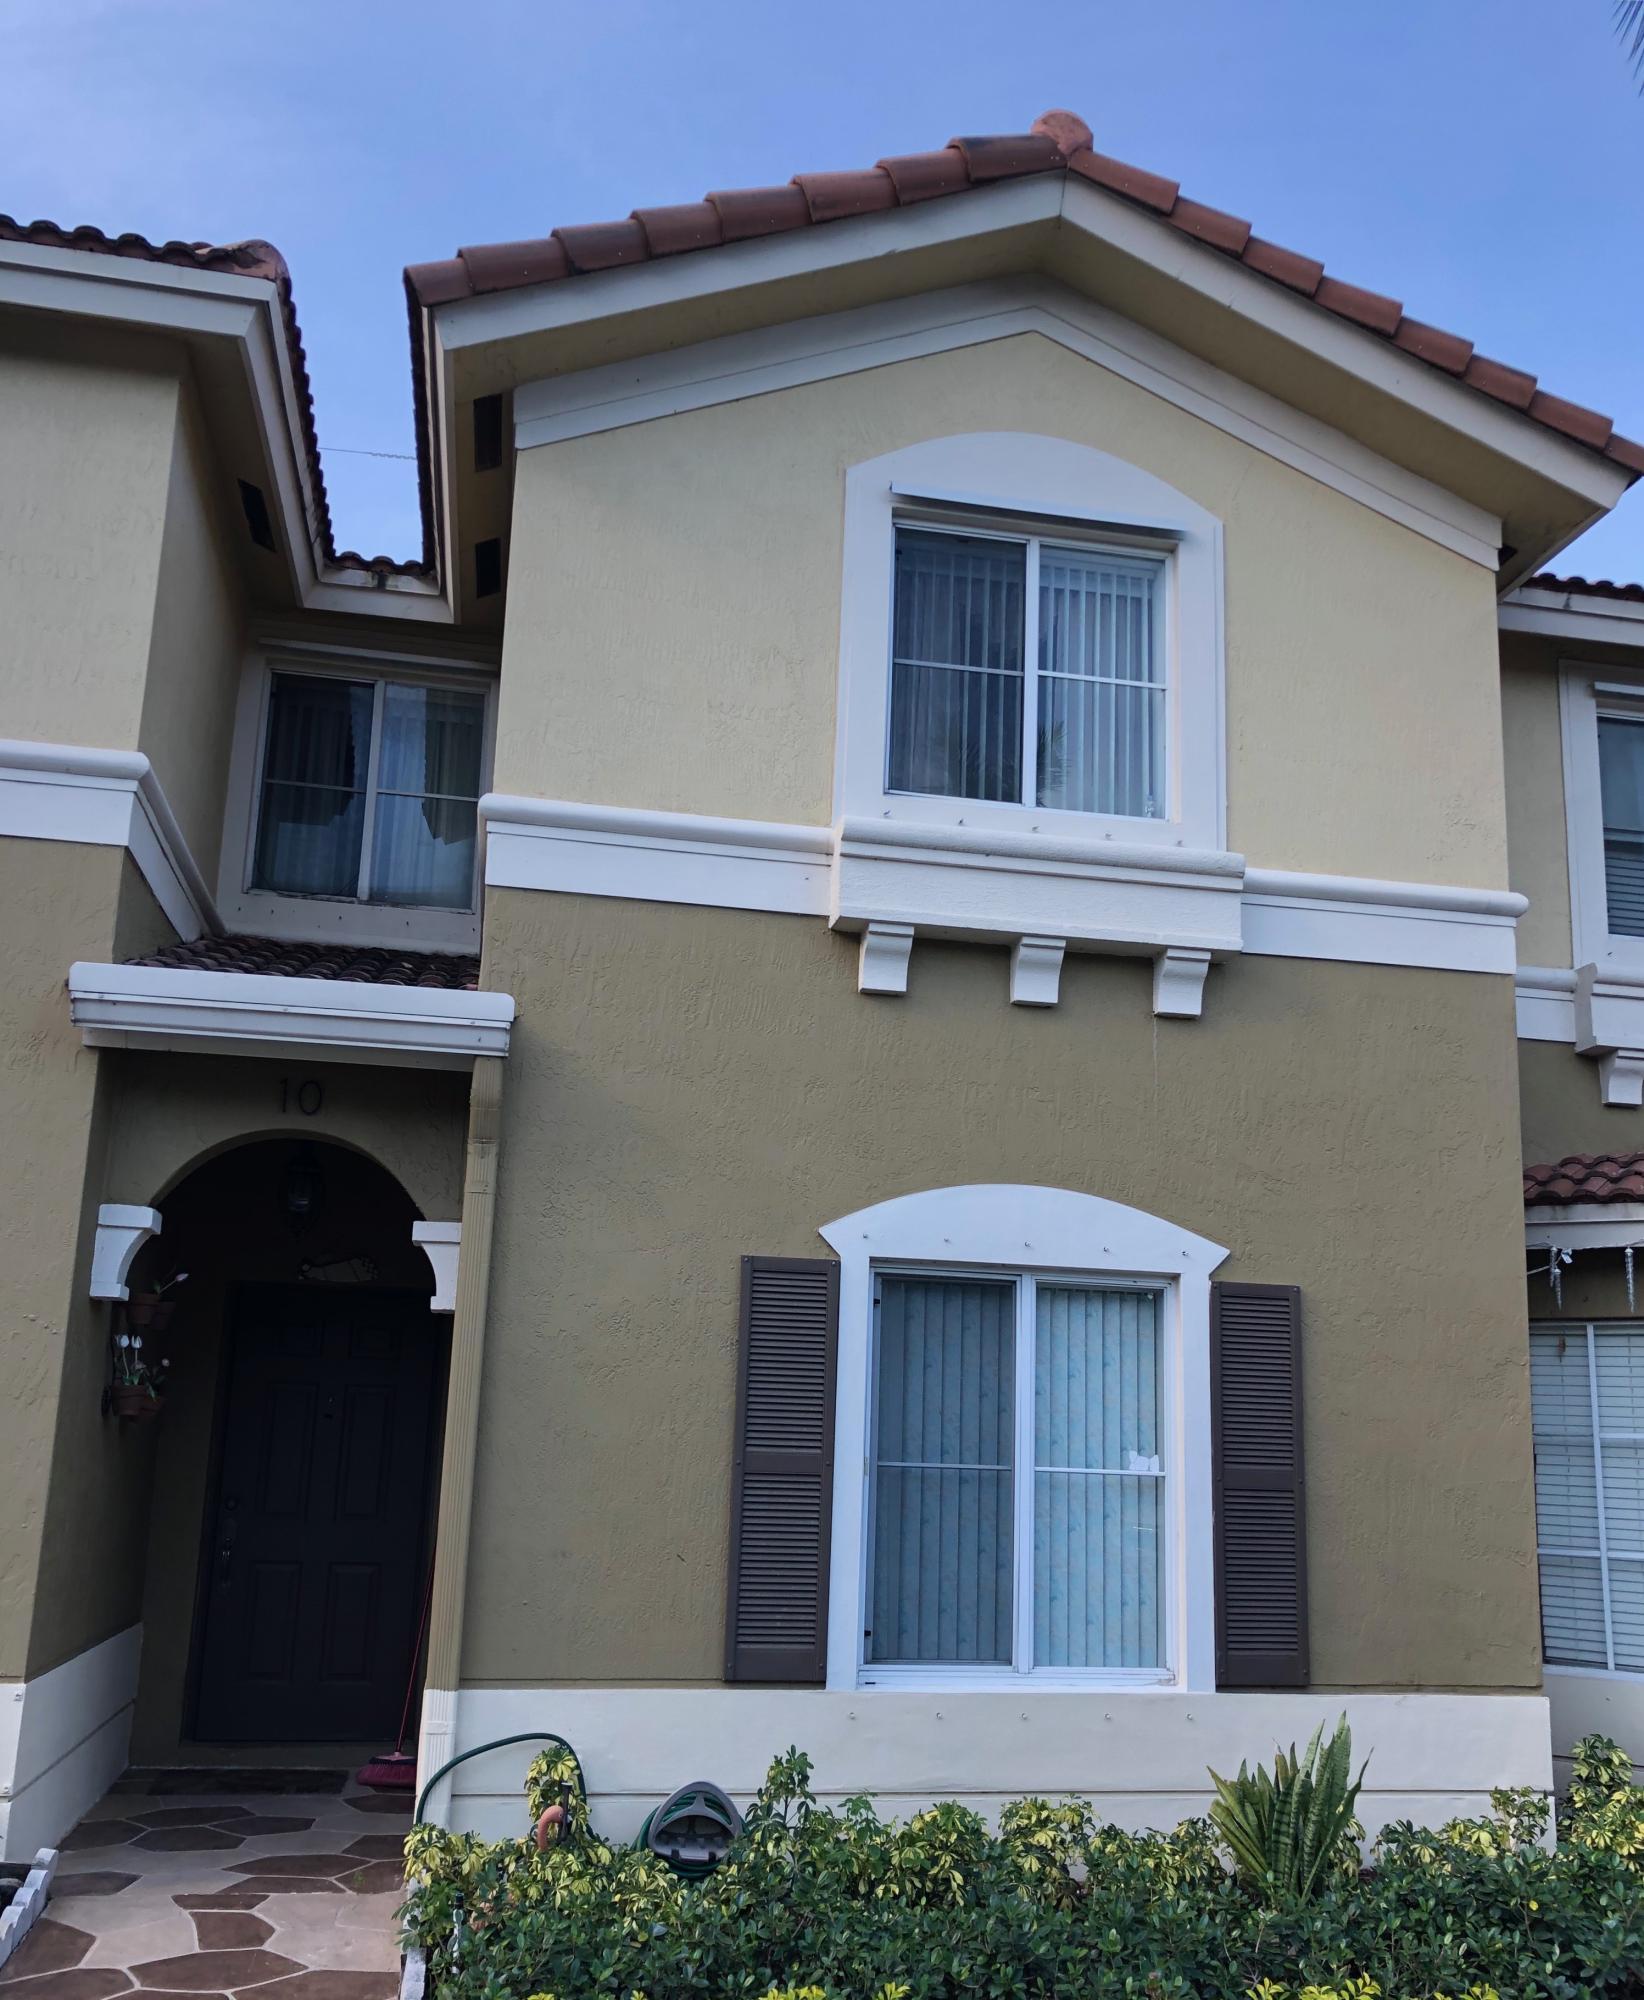 8900 W Flagler Street 10 Miami, FL 33174 Miami FL 33174